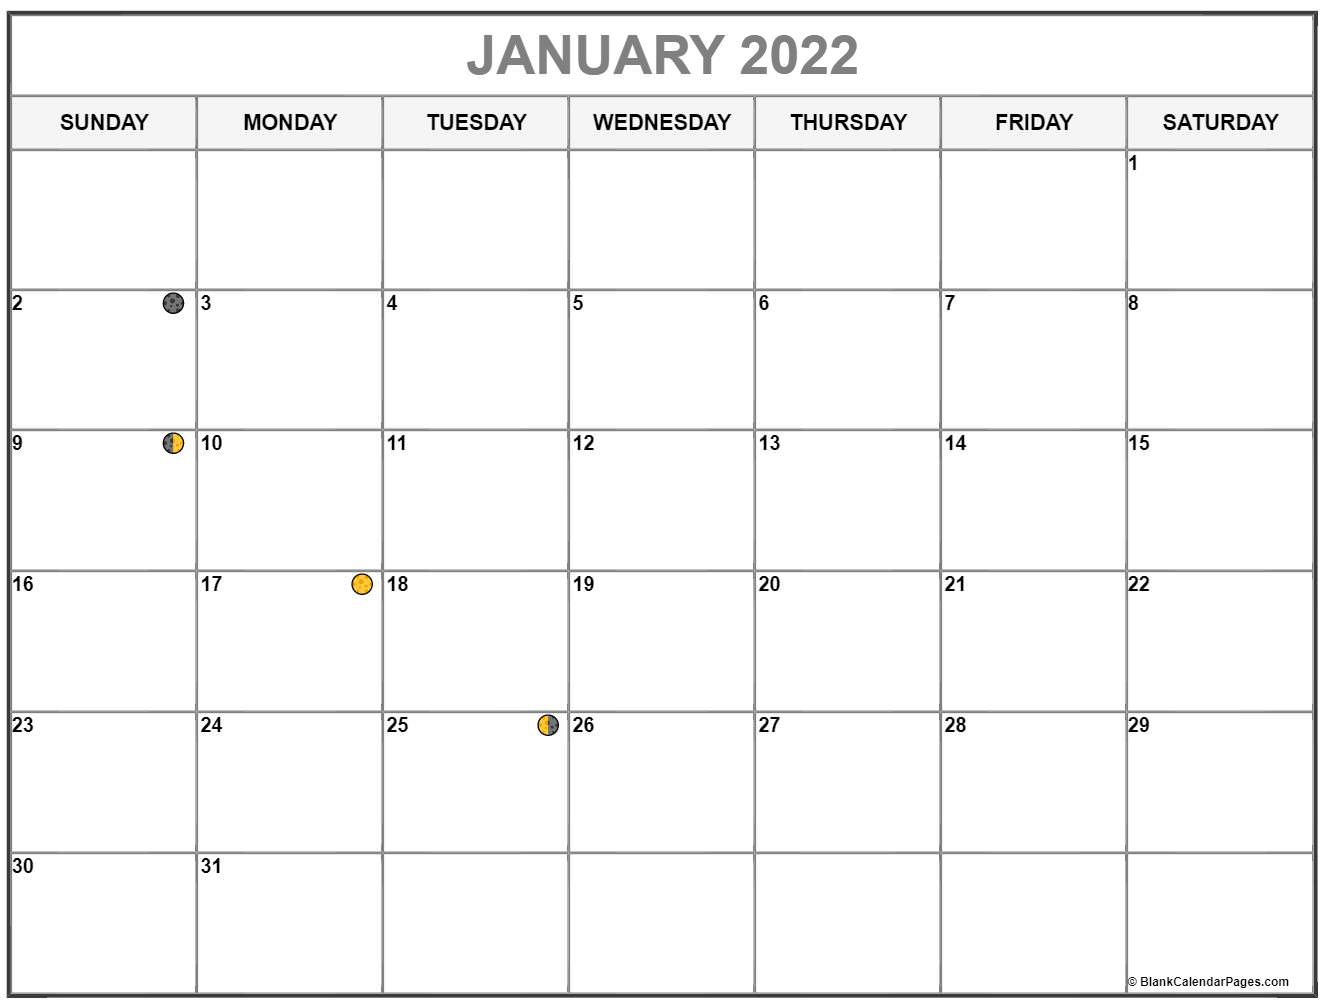 January Lunar Calendar